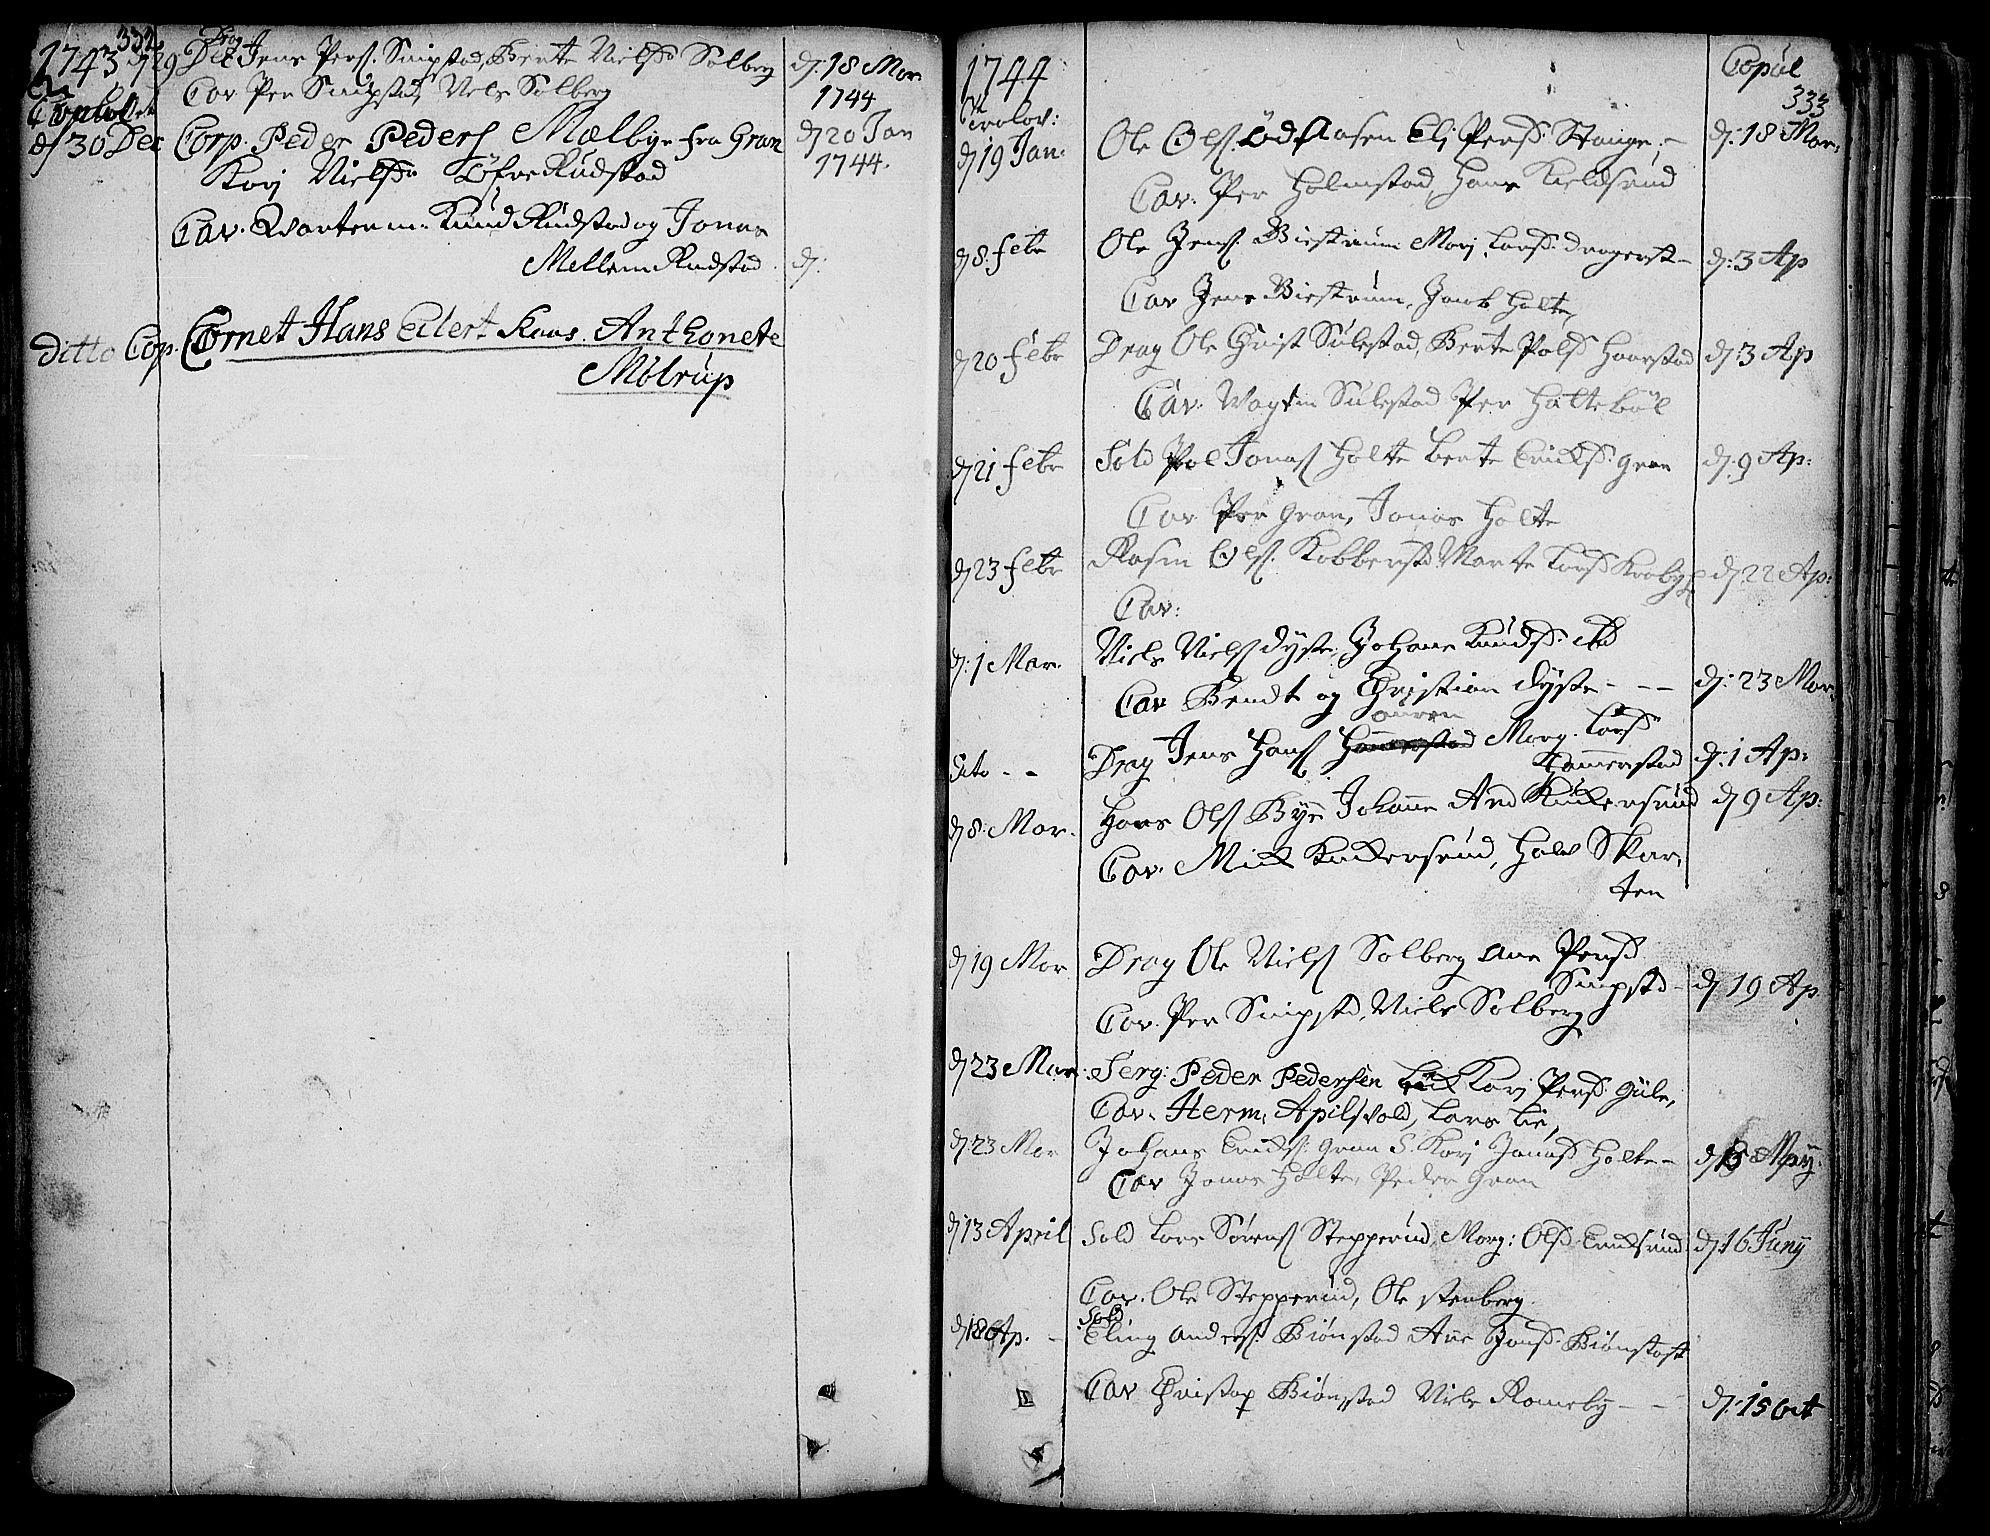 SAH, Toten prestekontor, Ministerialbok nr. 3, 1734-1751, s. 332-333